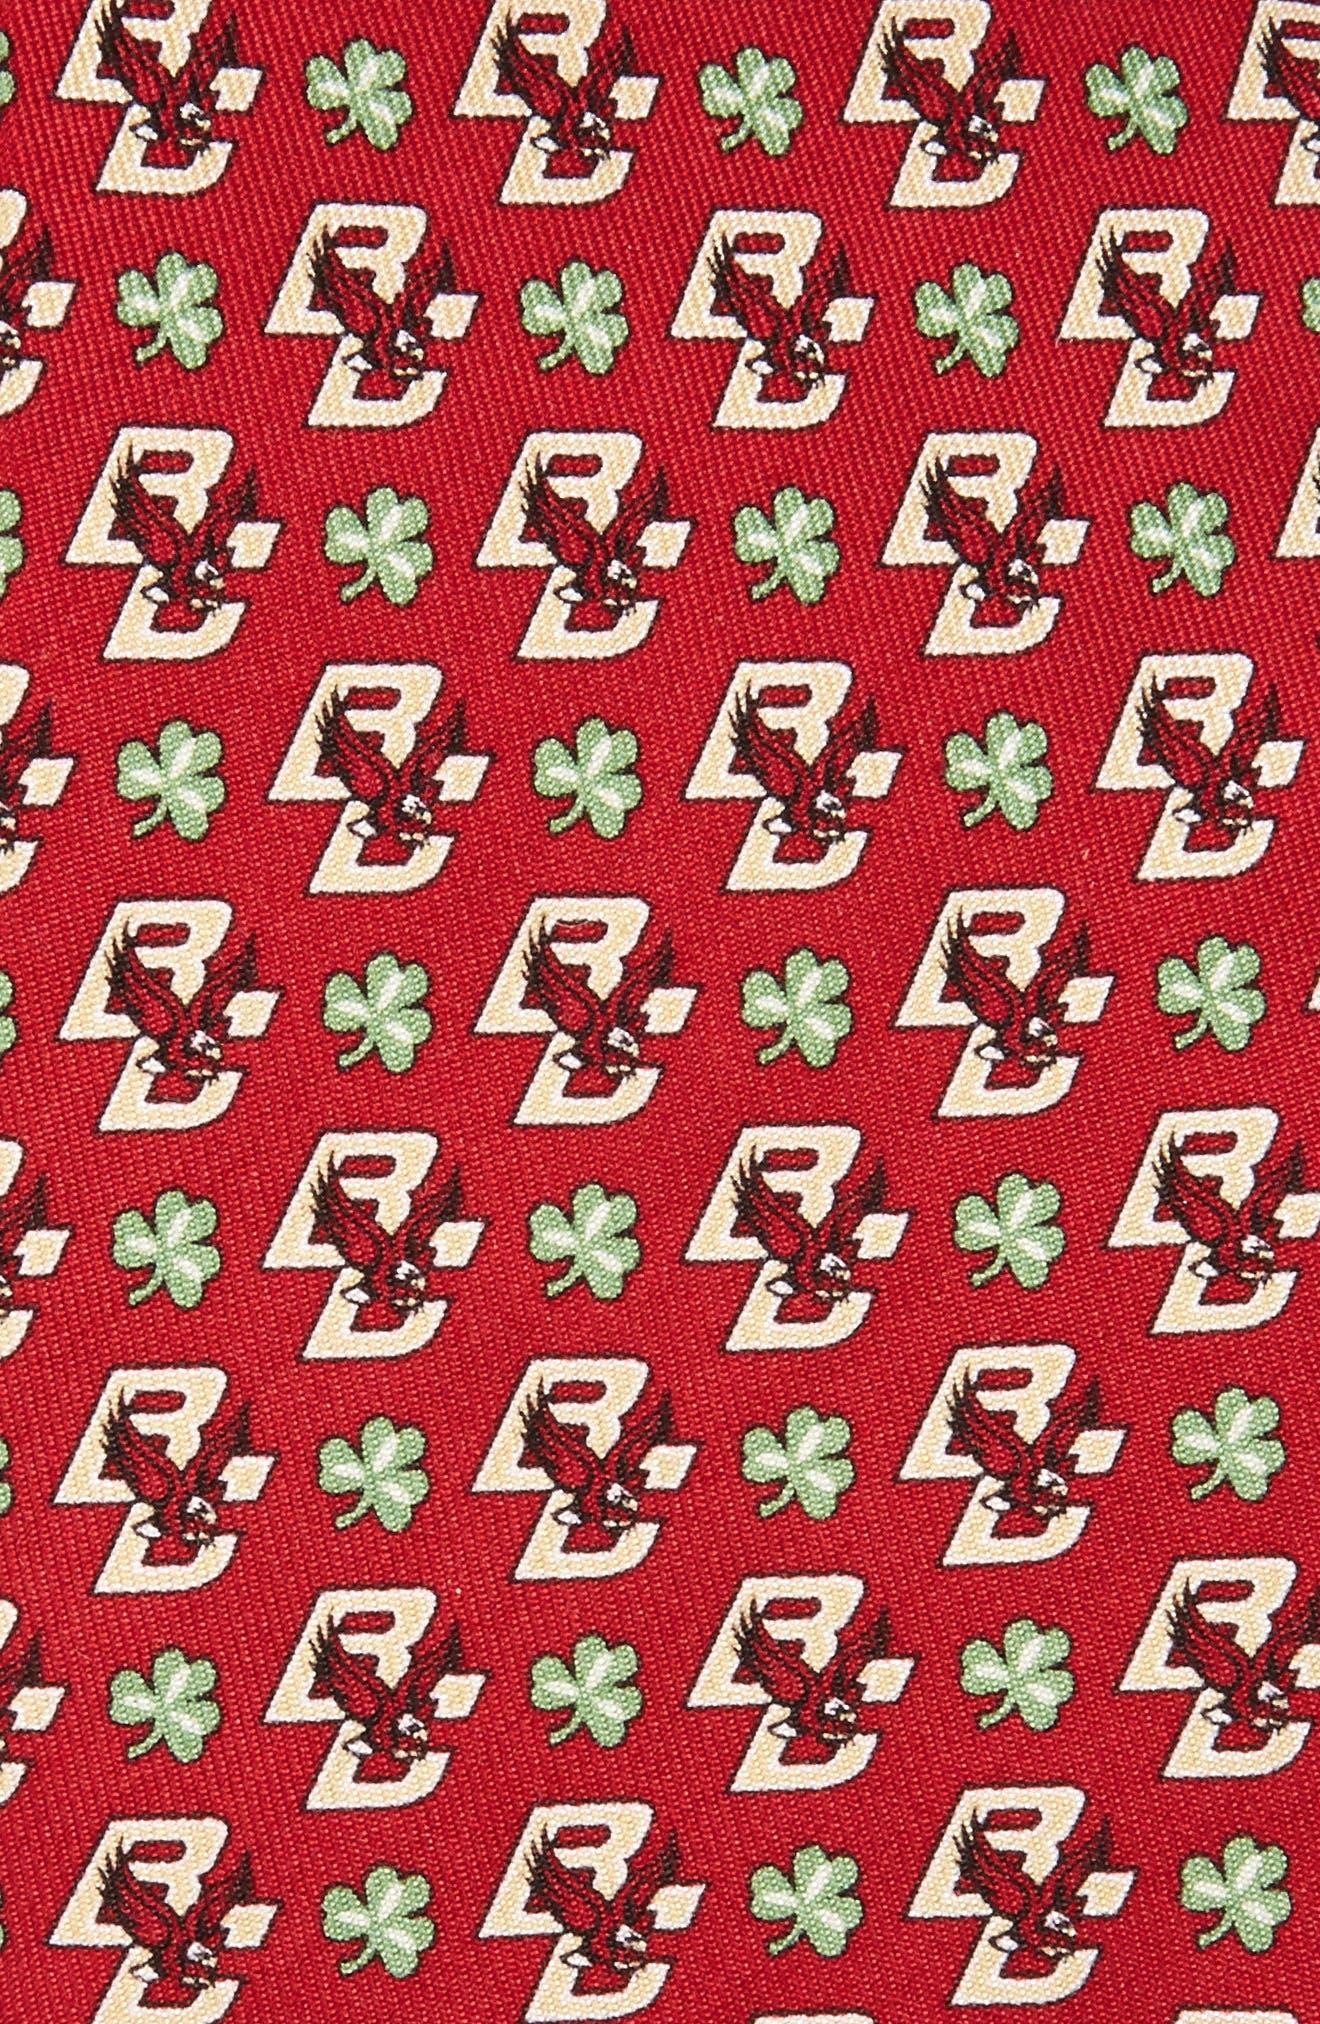 Boston College Eagles Silk Tie,                             Alternate thumbnail 2, color,                             College Maroon